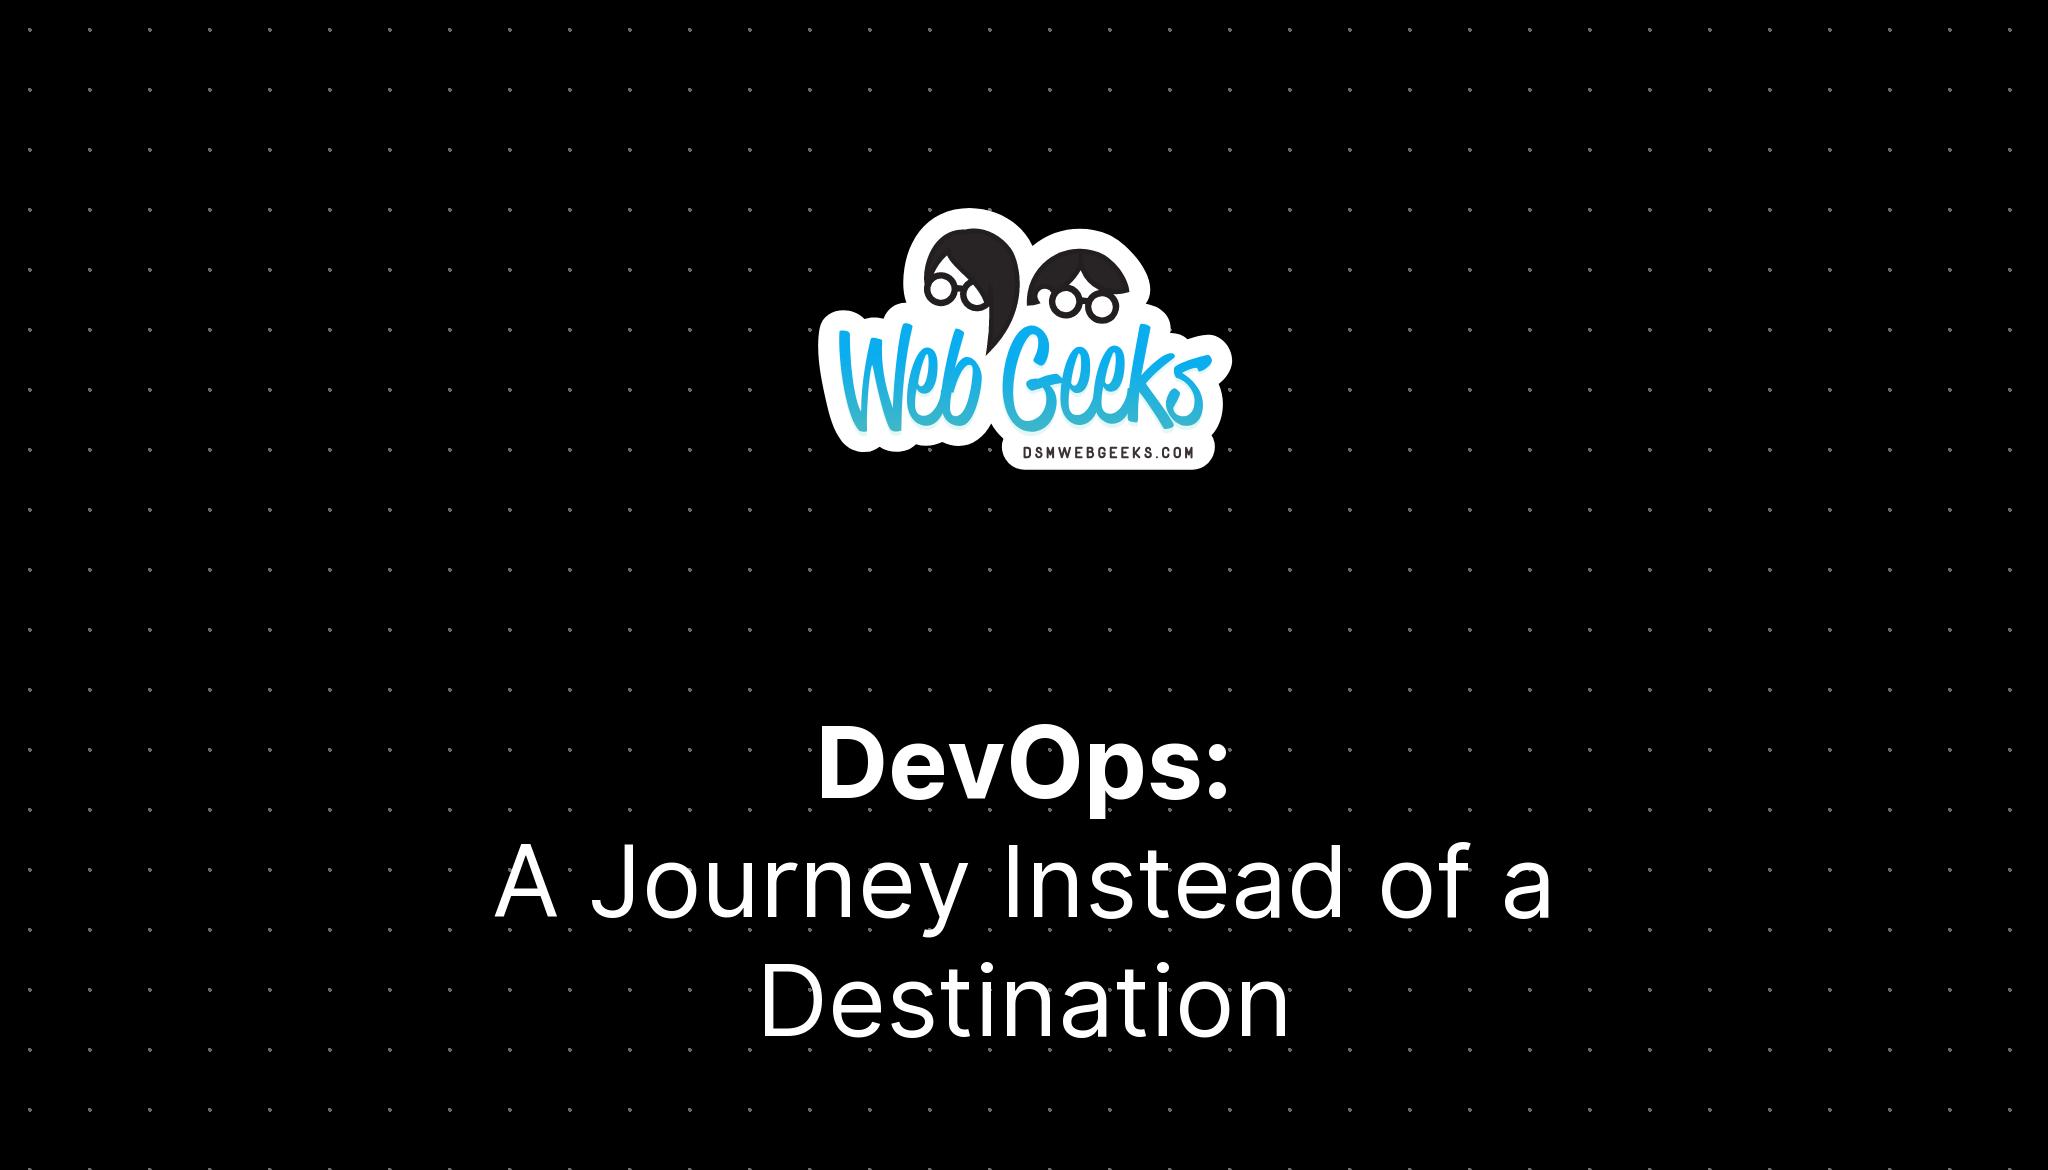 DevOps: A Journey instead of a Destination